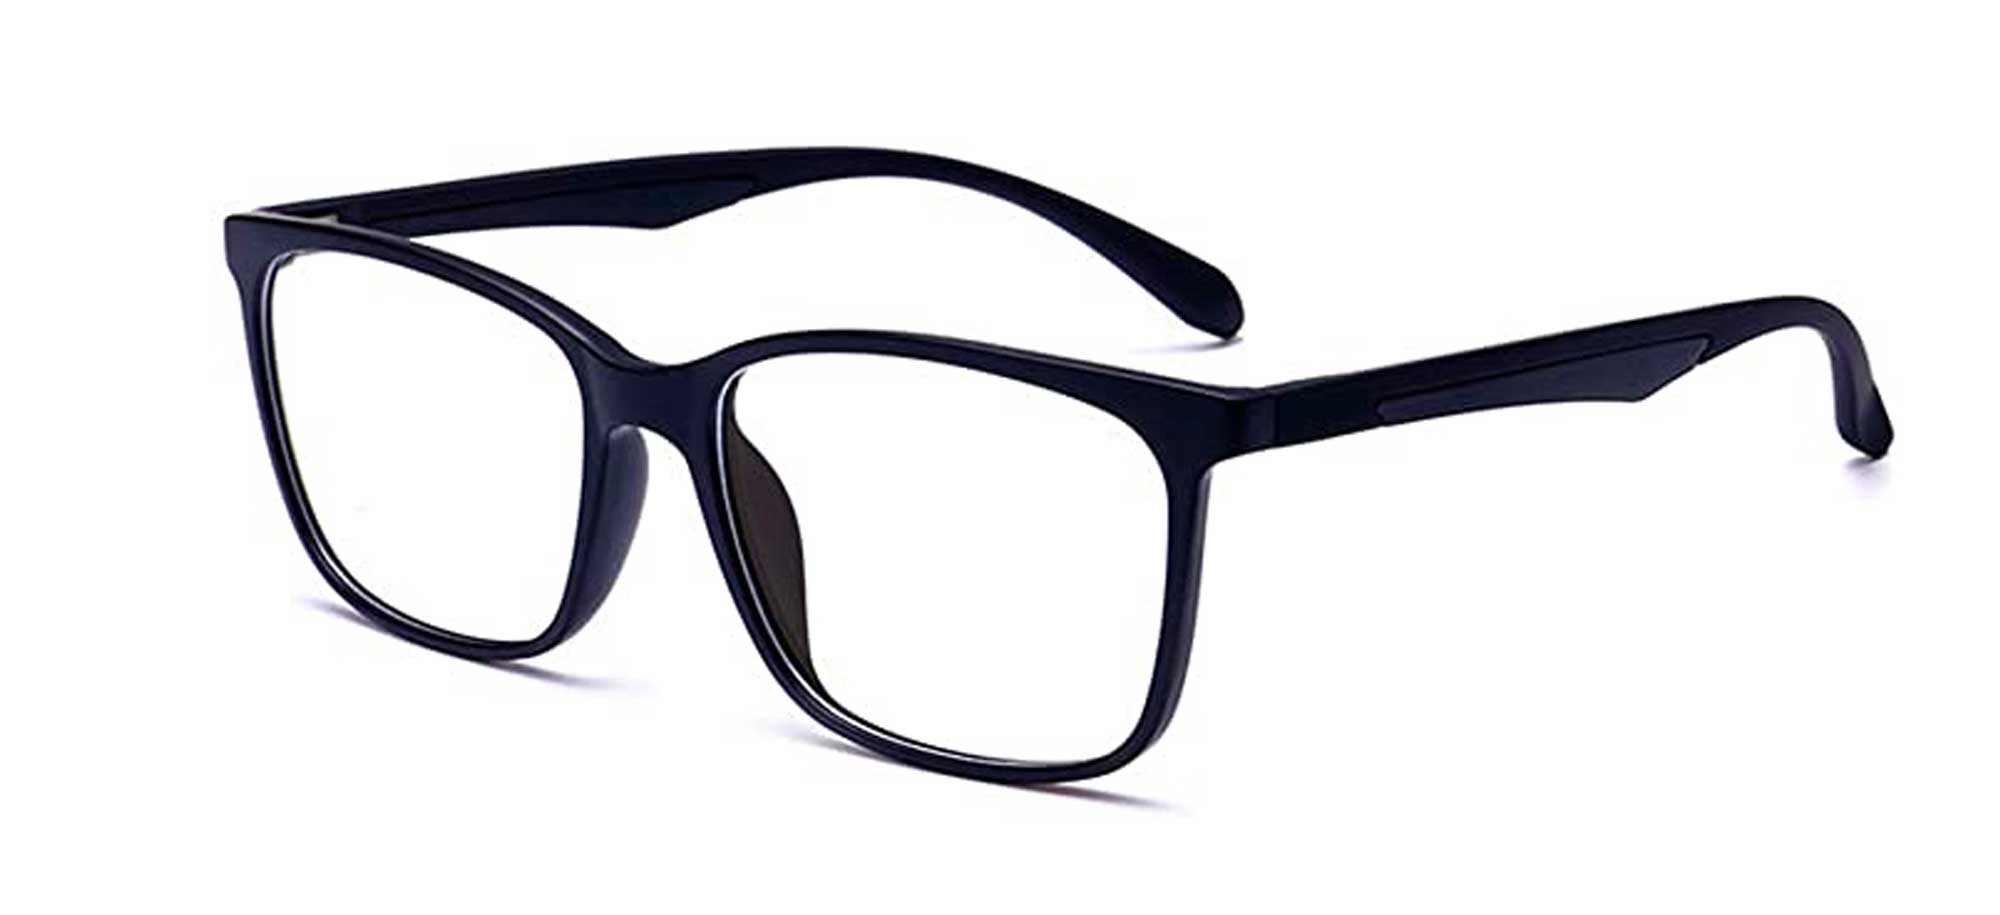 ANRRI Blue Light Blocking Glasses Lightweight Eyeglasses Frame Filter Blue Ray Computer Game Glasses